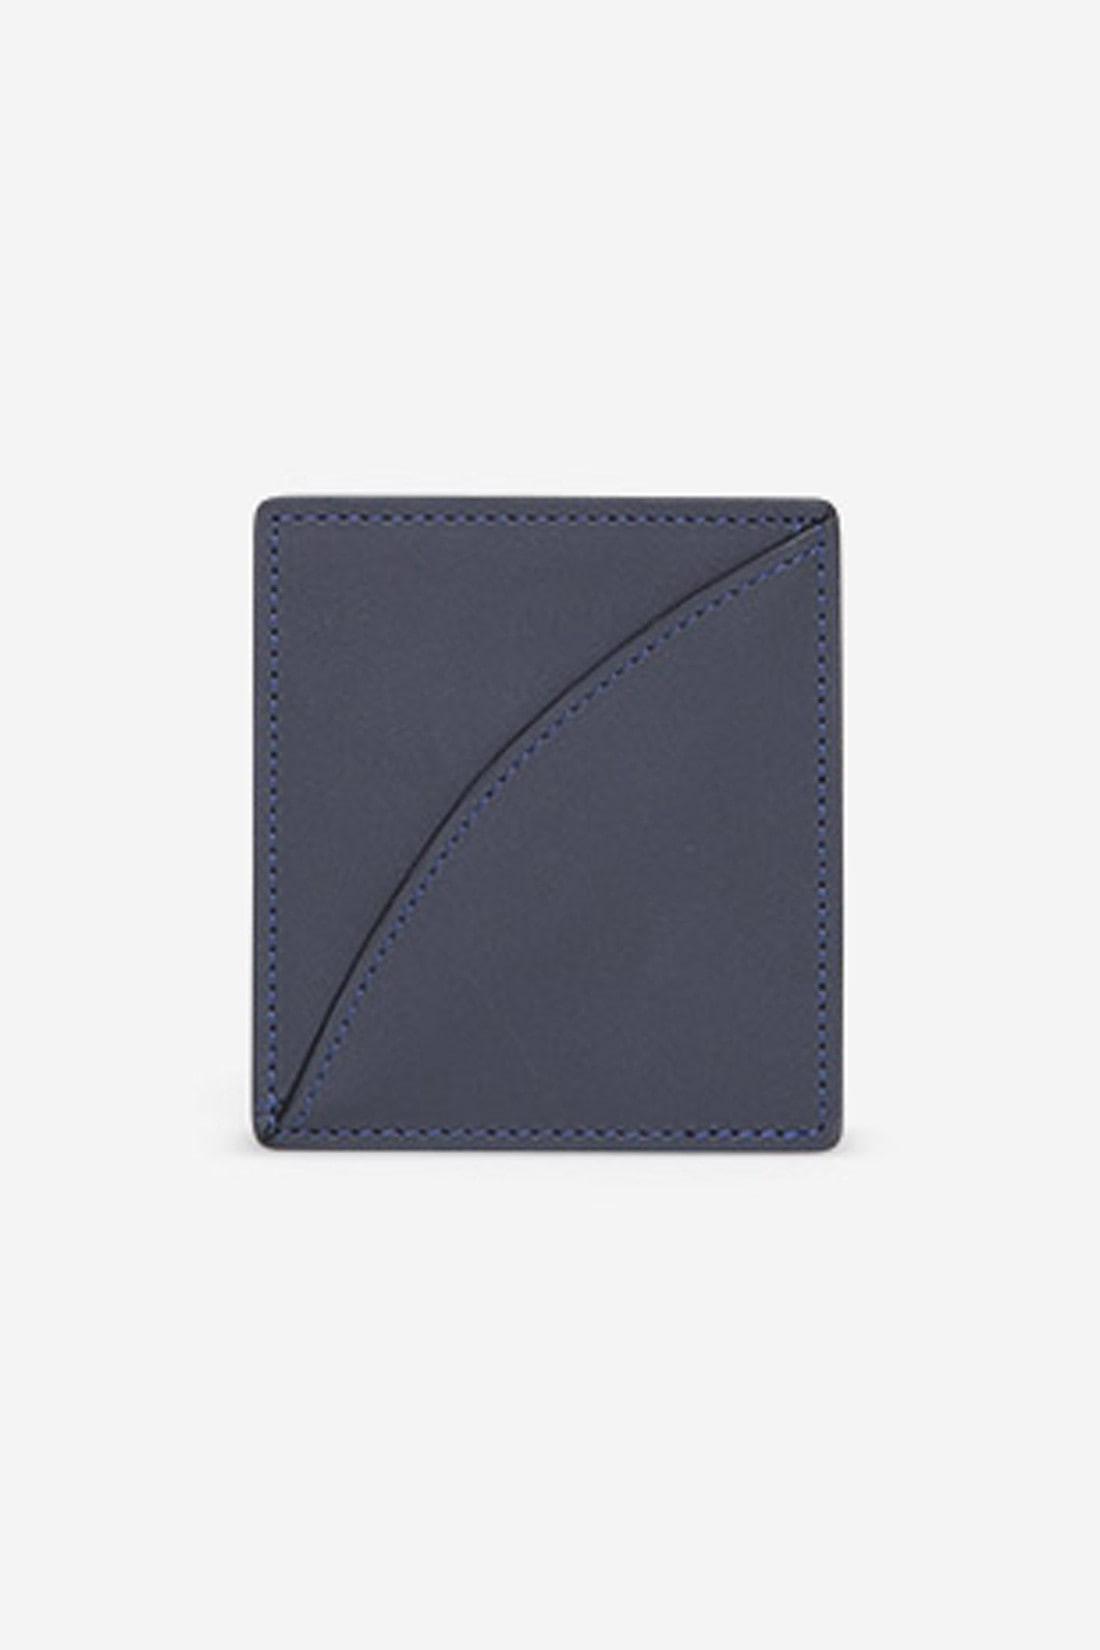 / Cm39 purse Blue